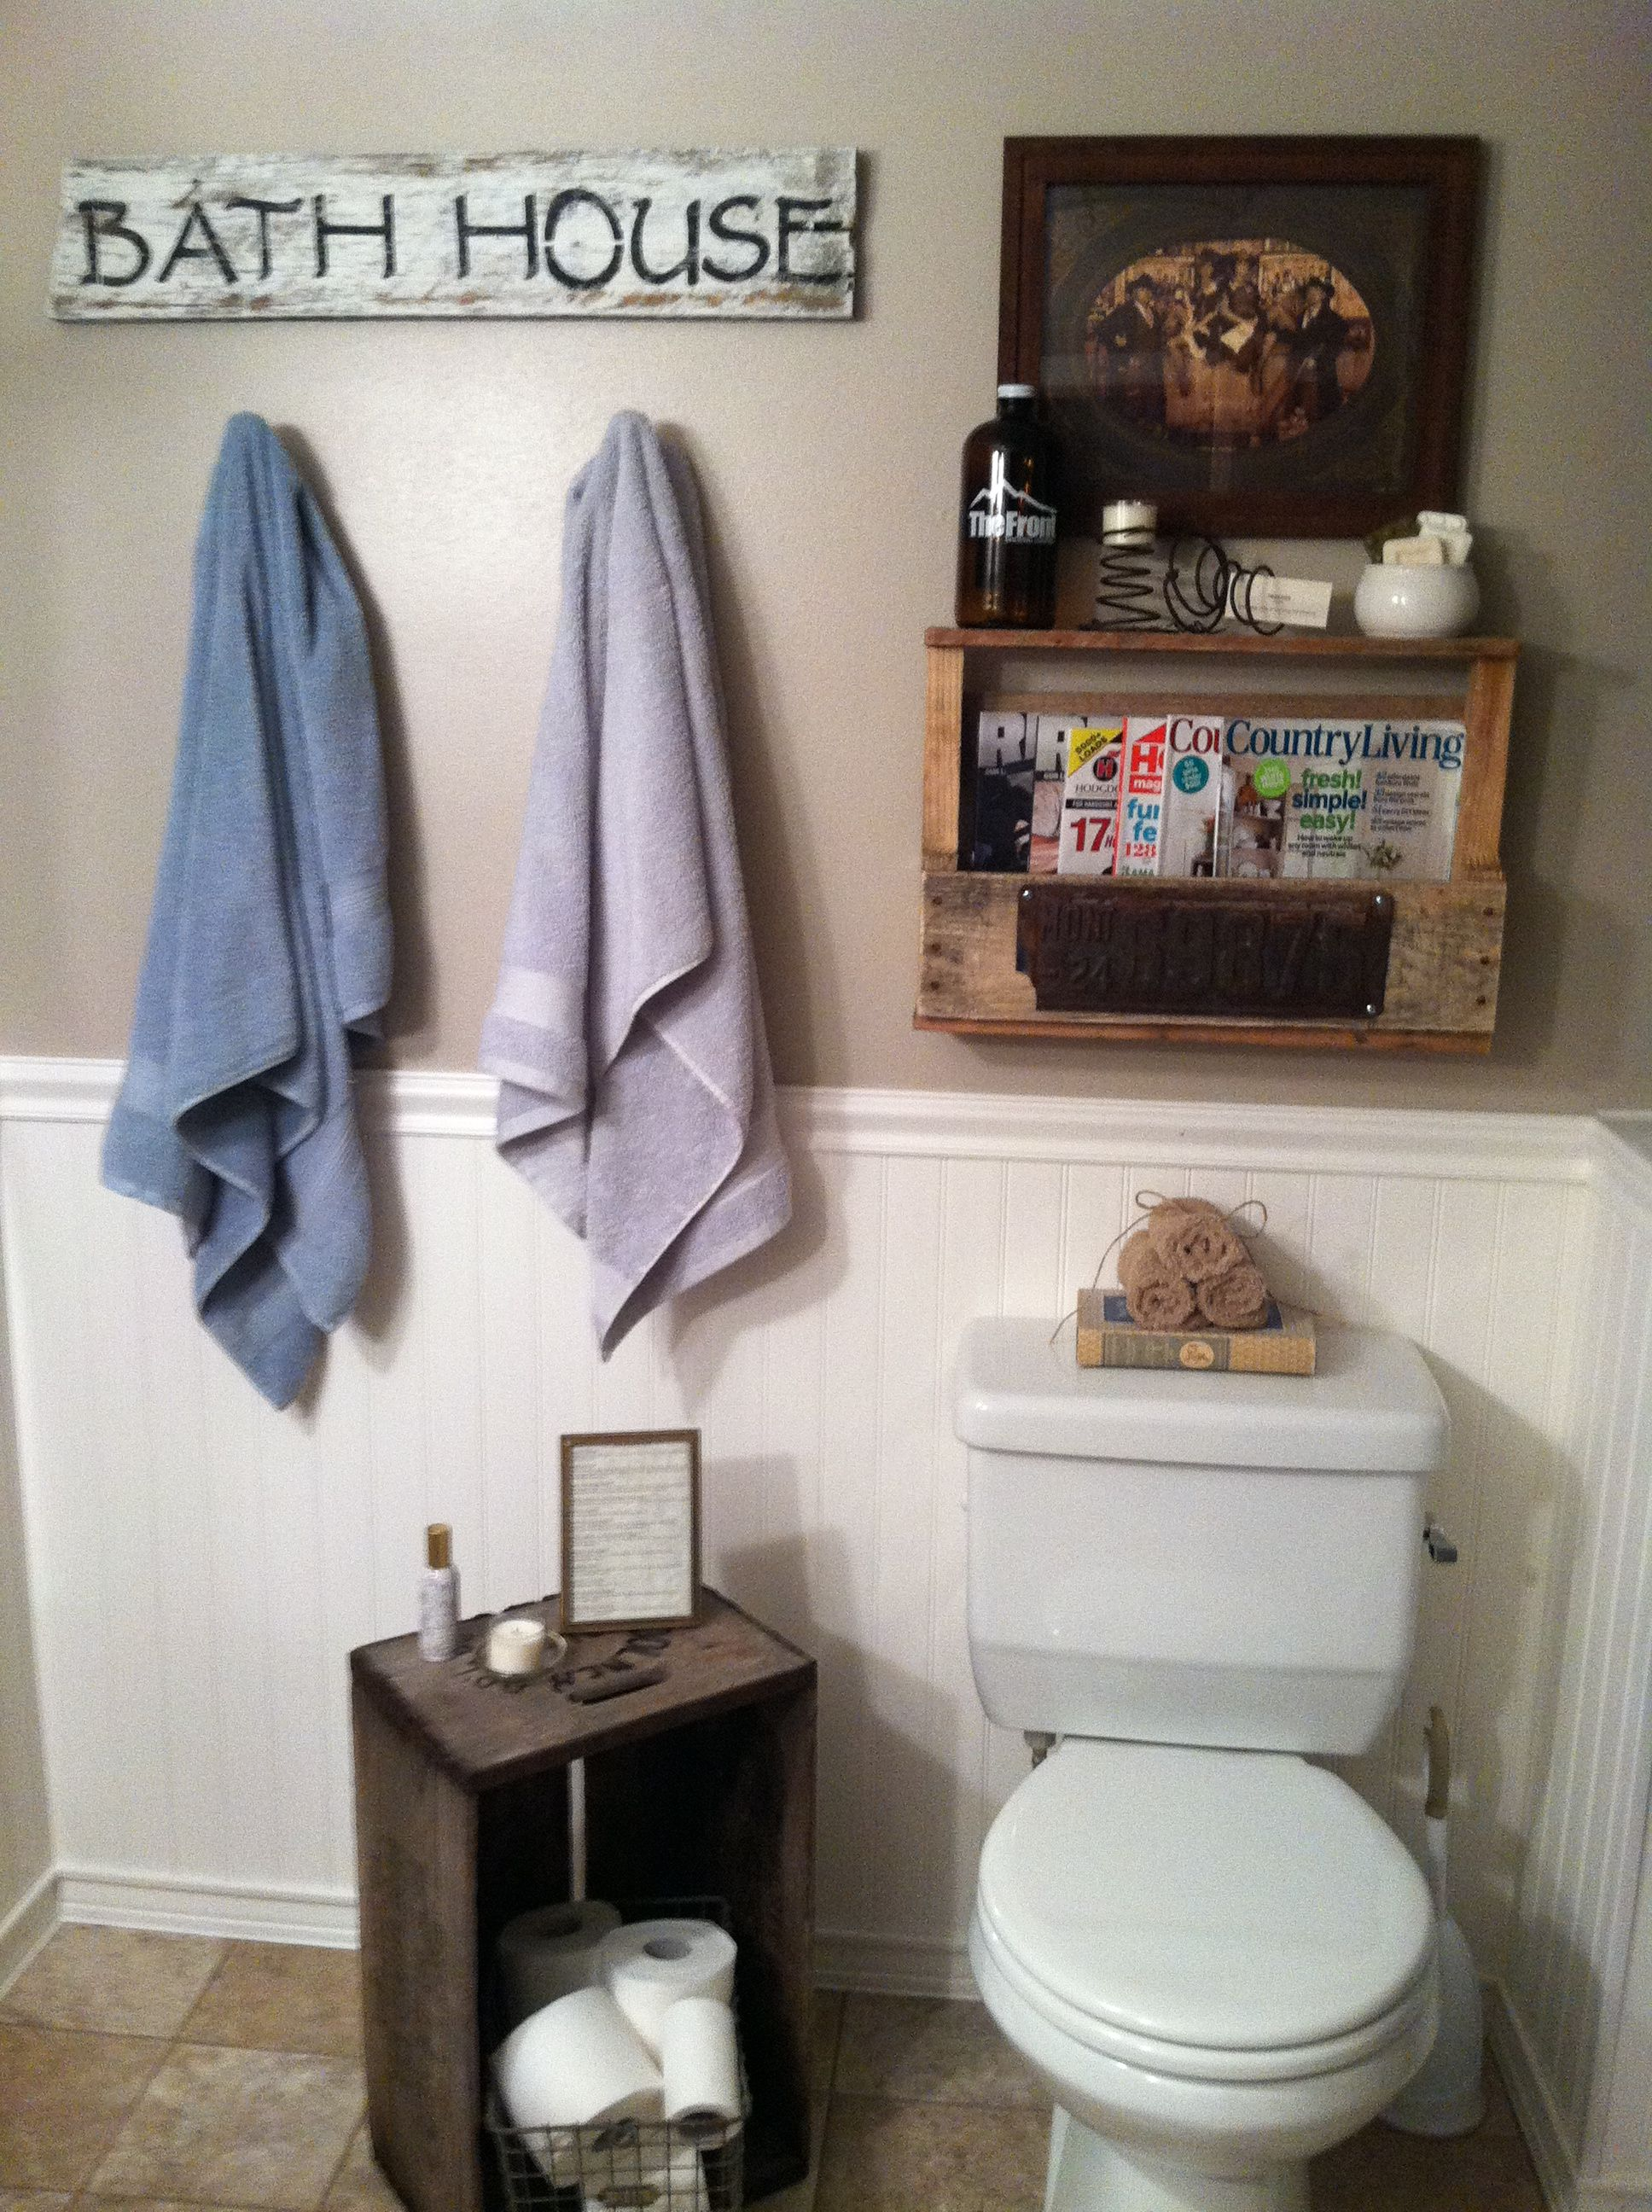 Rustic Bathroom Decor Reclaimed Crate Pallet Shelf Bathroom Shelving And Stora Diy Bathroom Decor Rustic Bathroom Accessories Rustic Bathroom Wall Decor